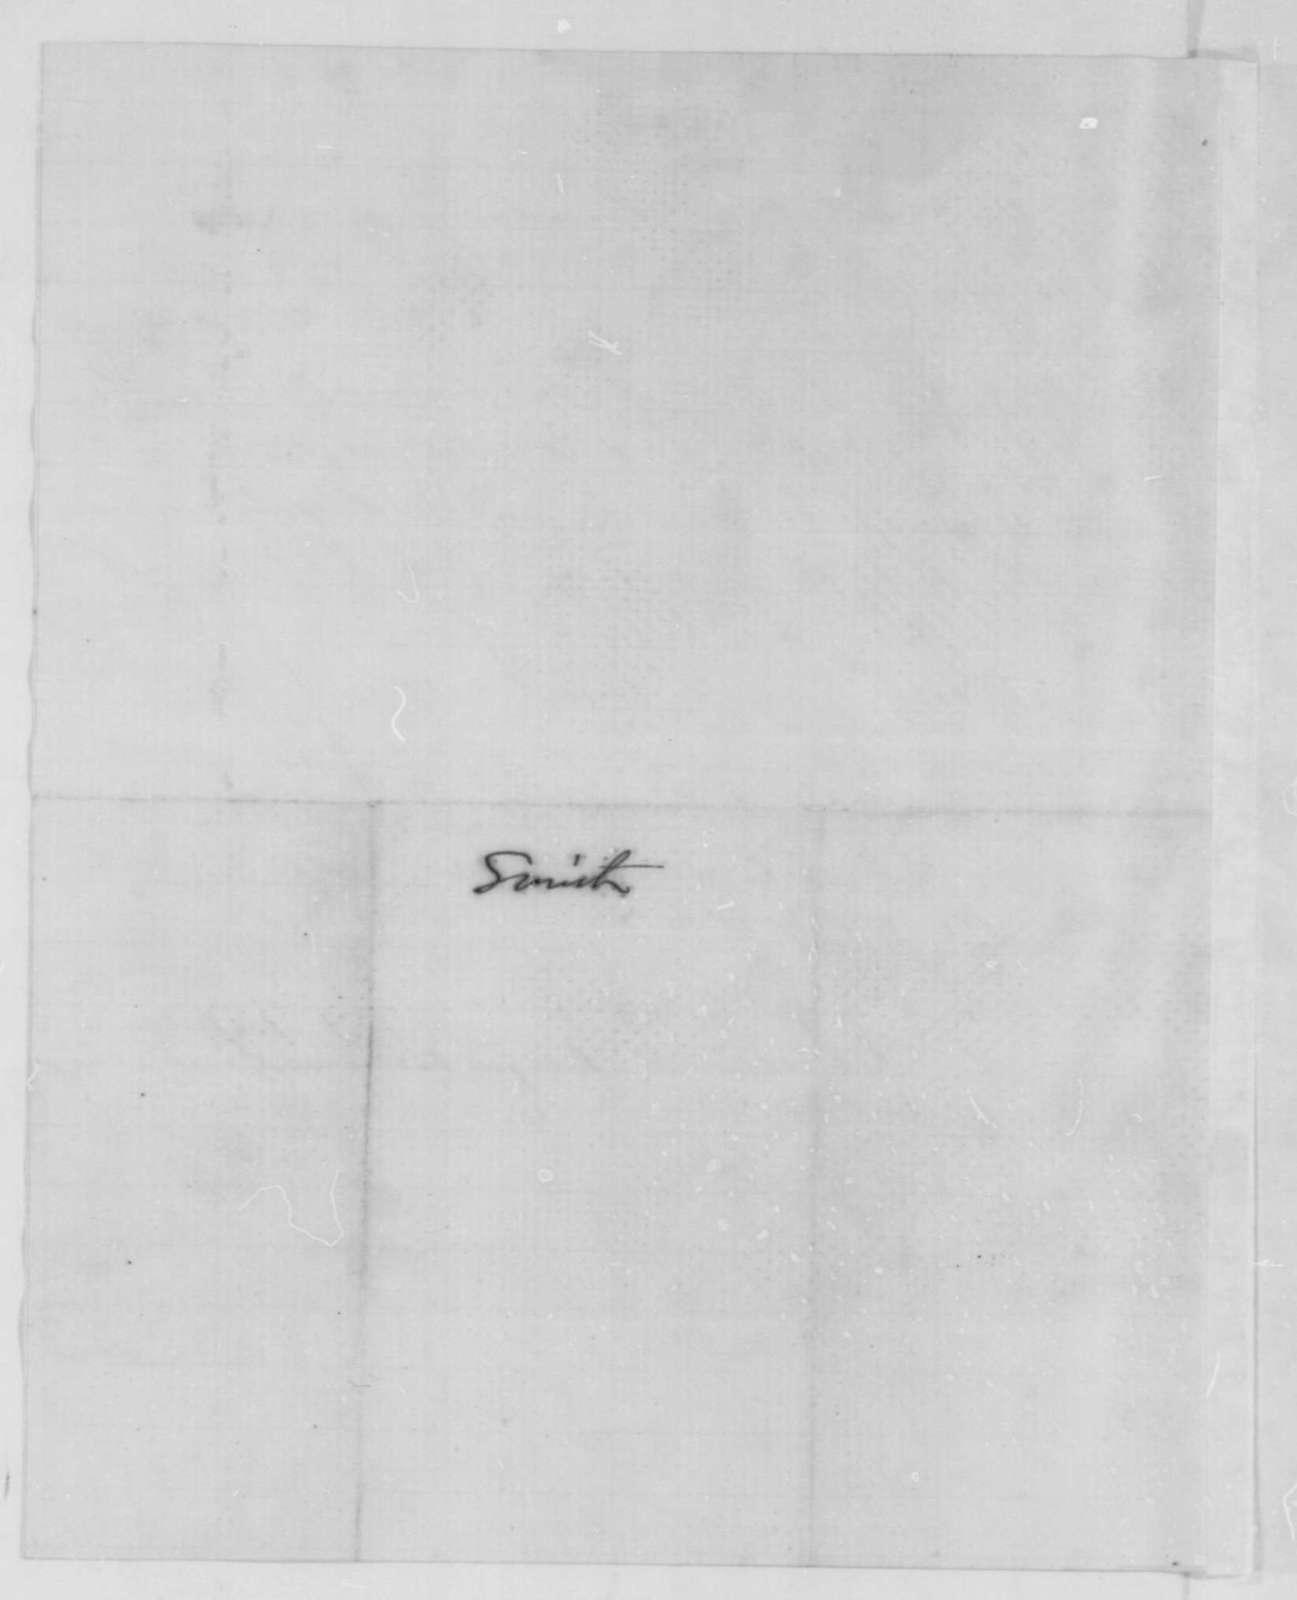 David W. Cheesman and John P. Zane to Abraham Lincoln, February 1861  (Recommend Caleb Smith for cabinet)